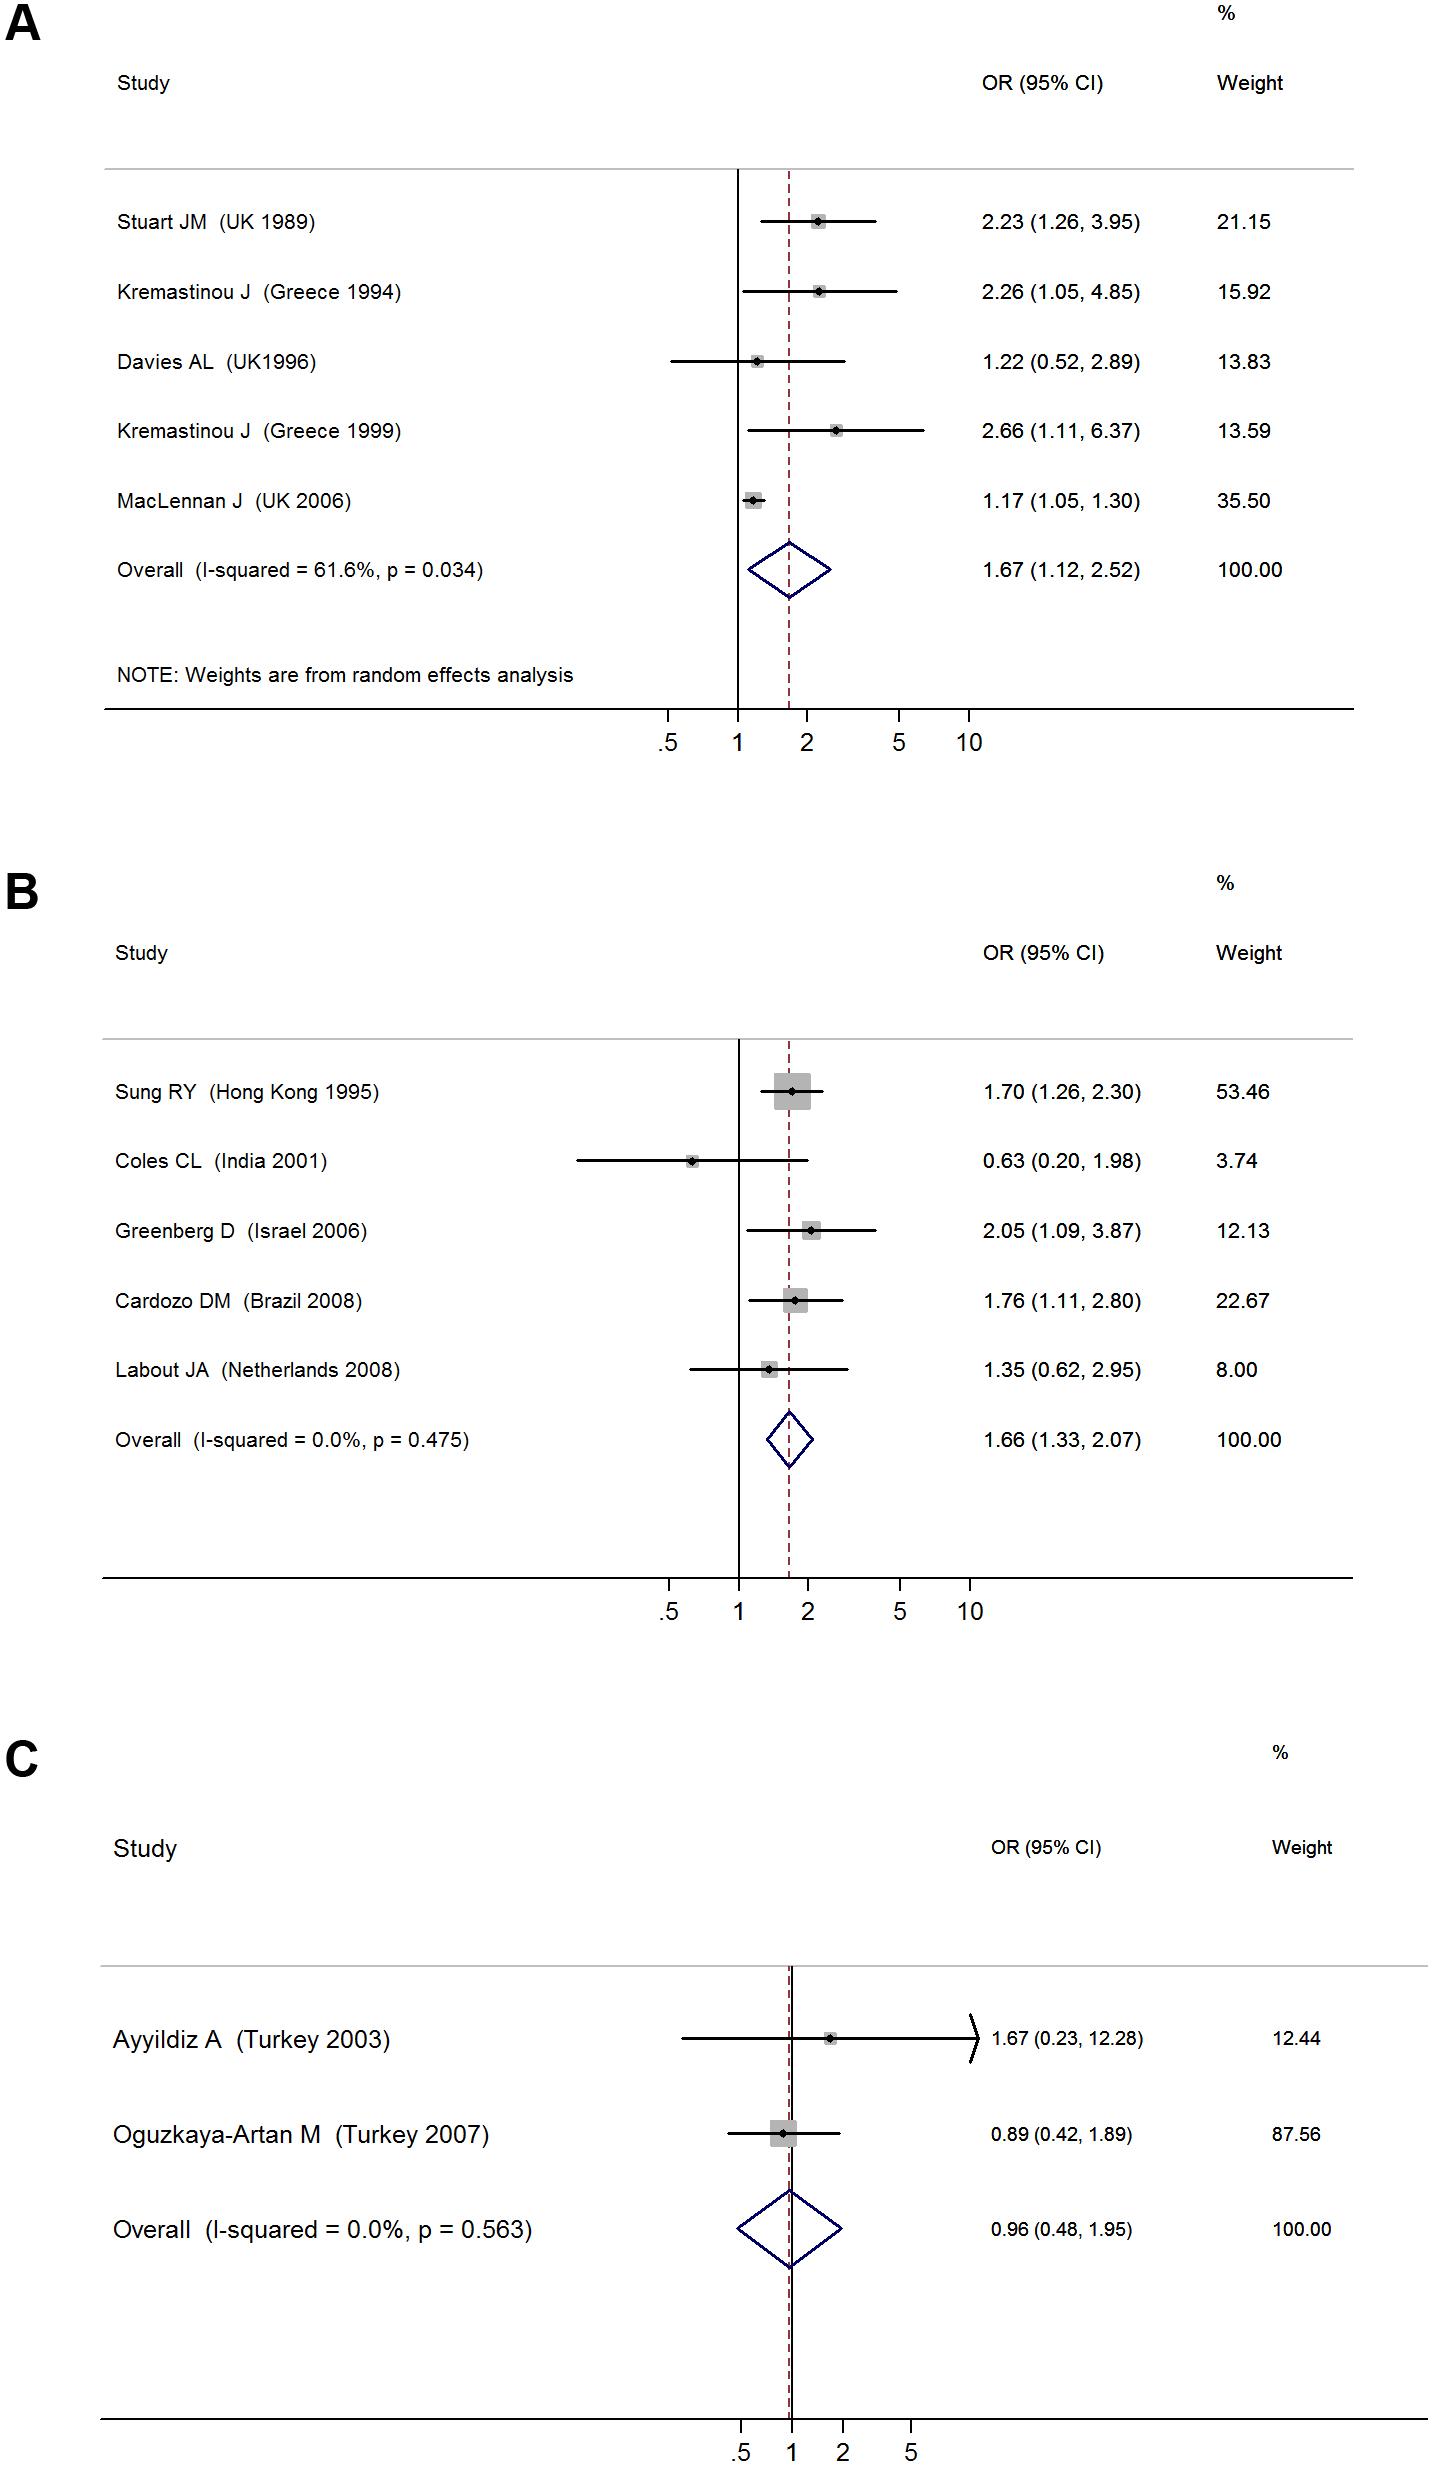 ORs for pharyngeal carriage of bacteria for exposure to secondhand smoke compared to nonexposure: (A) <i>N. meningitidis</i>, (B) <i>S. pneumonia</i>, (C) Hib.